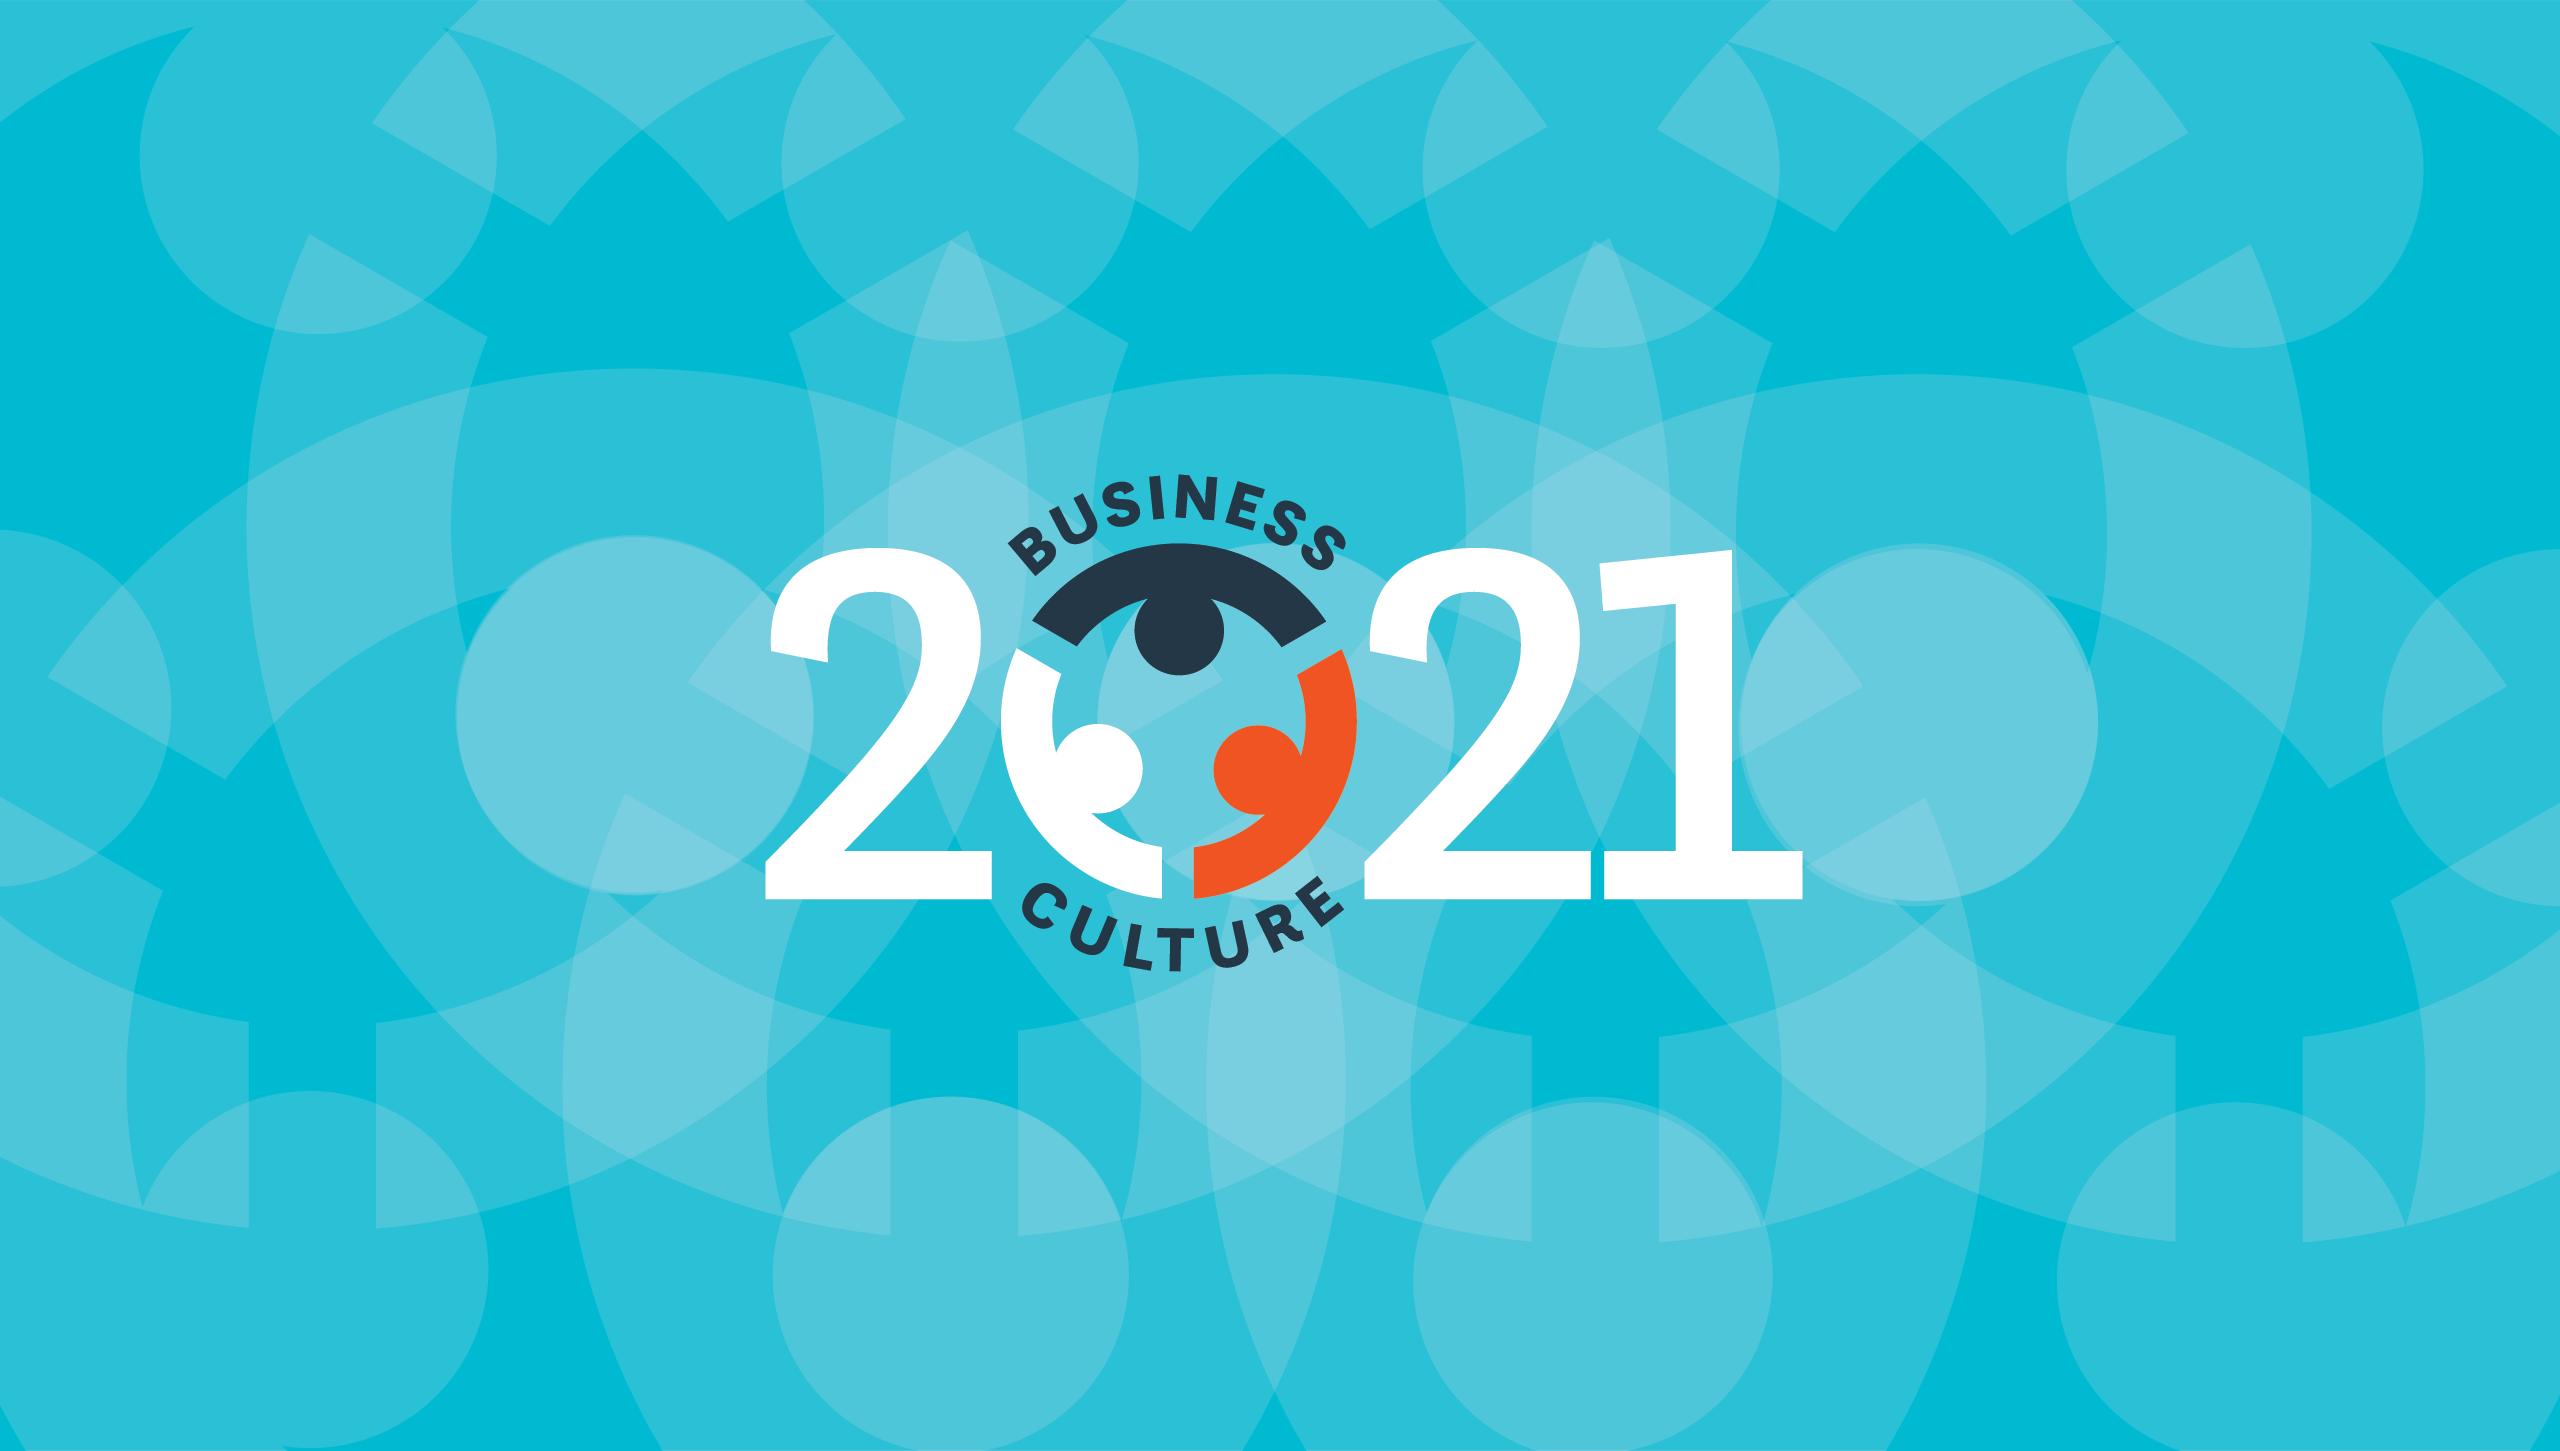 2021 Business Culture